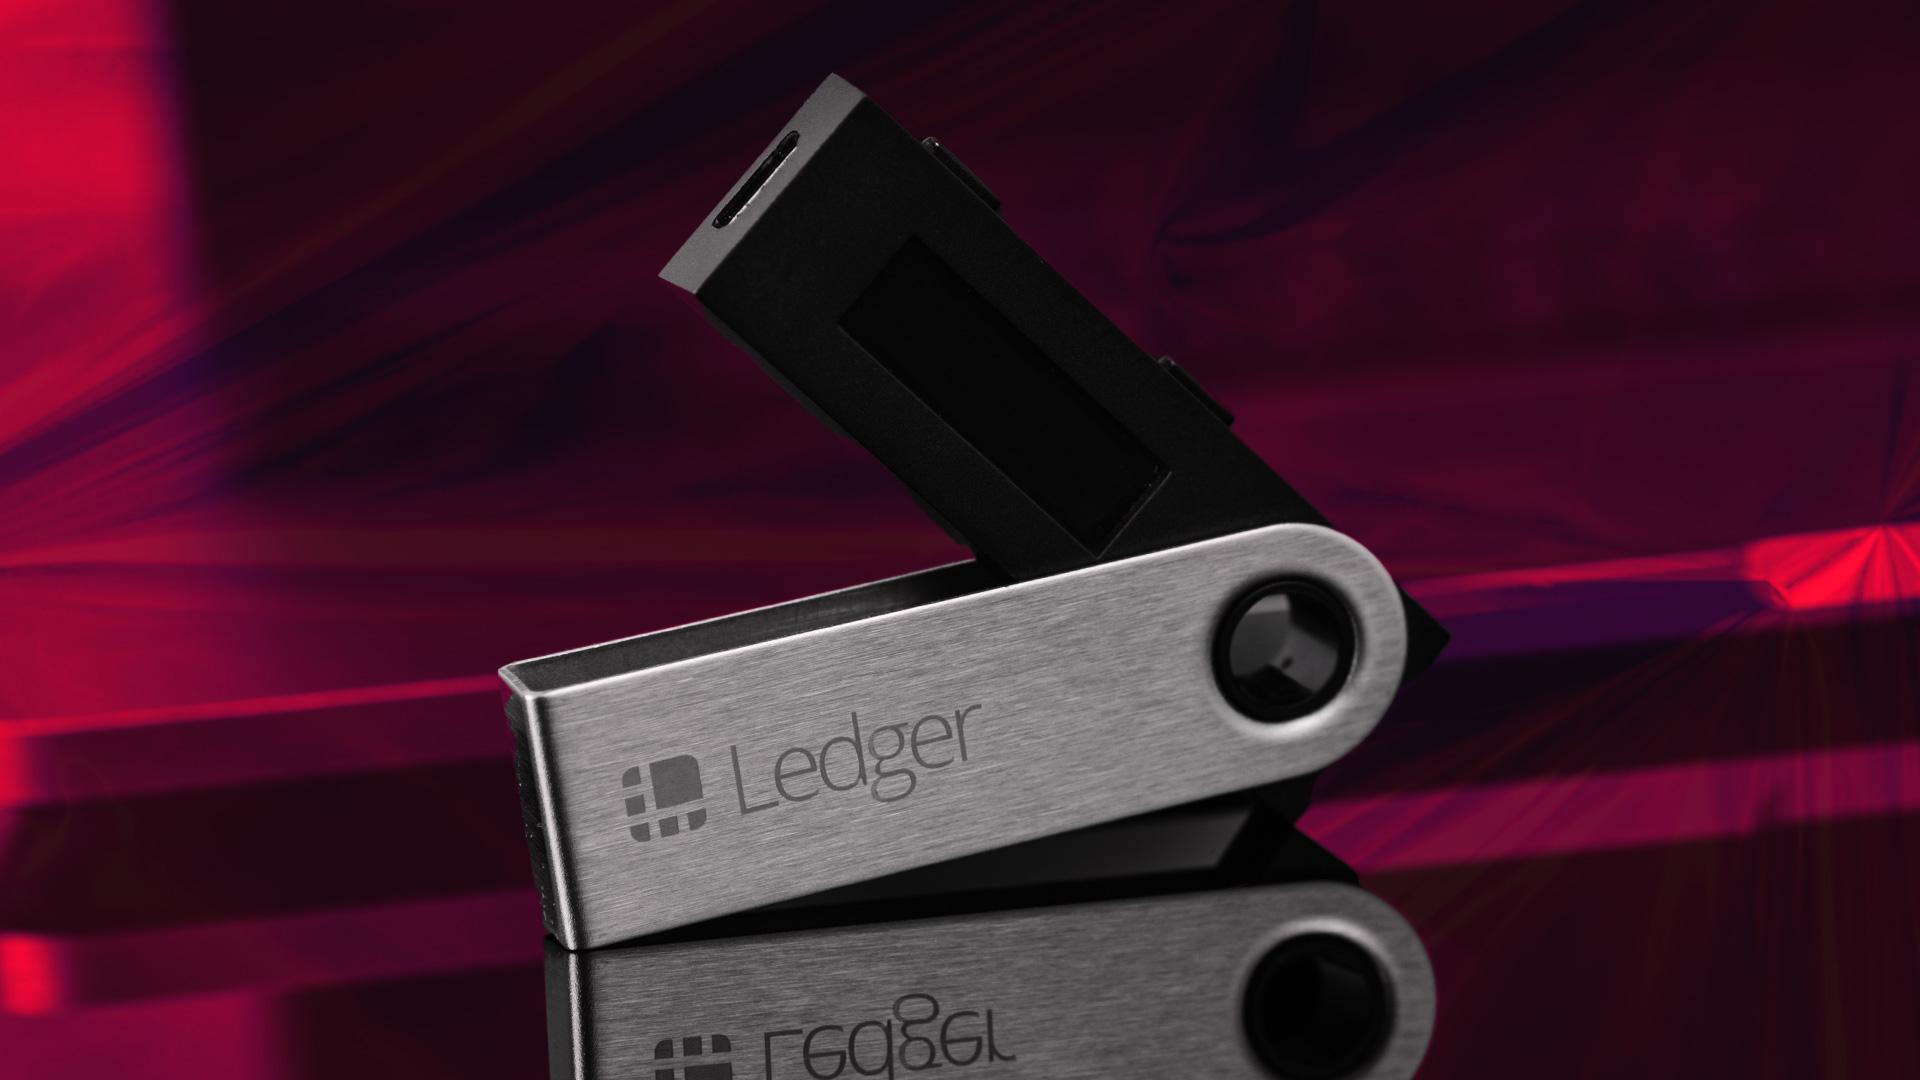 Crypto wallet app Ledger Live integrates its first DeFi platform, ParaSwap